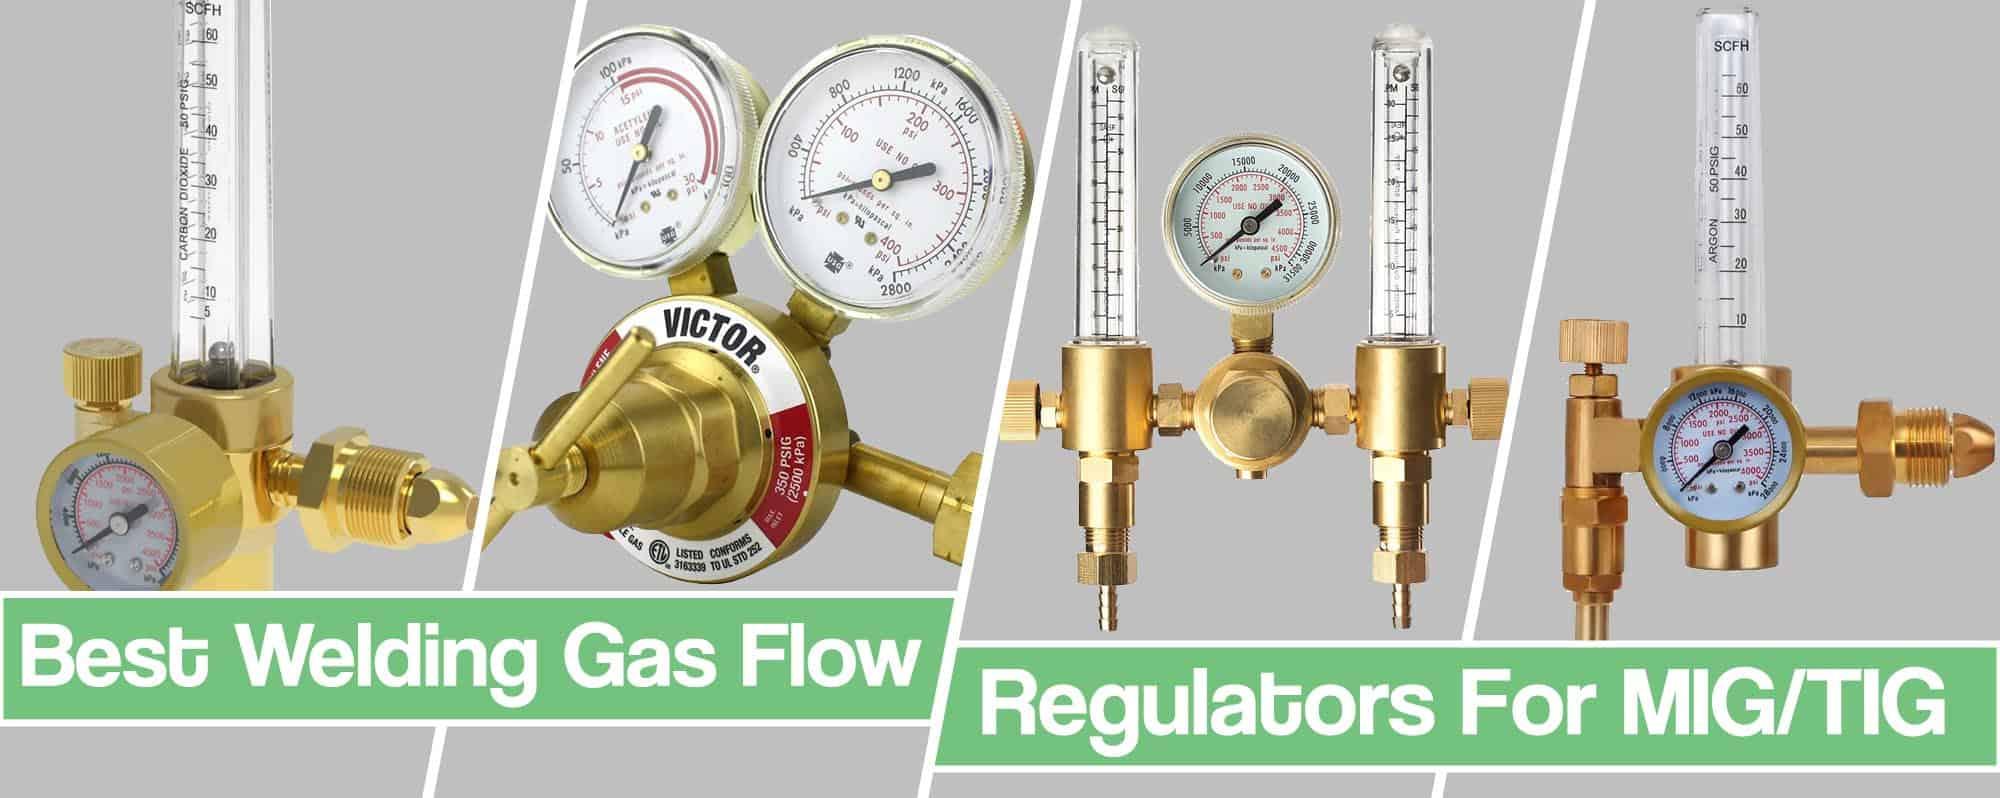 Feature image for Best Welding Gas flow Regulator article